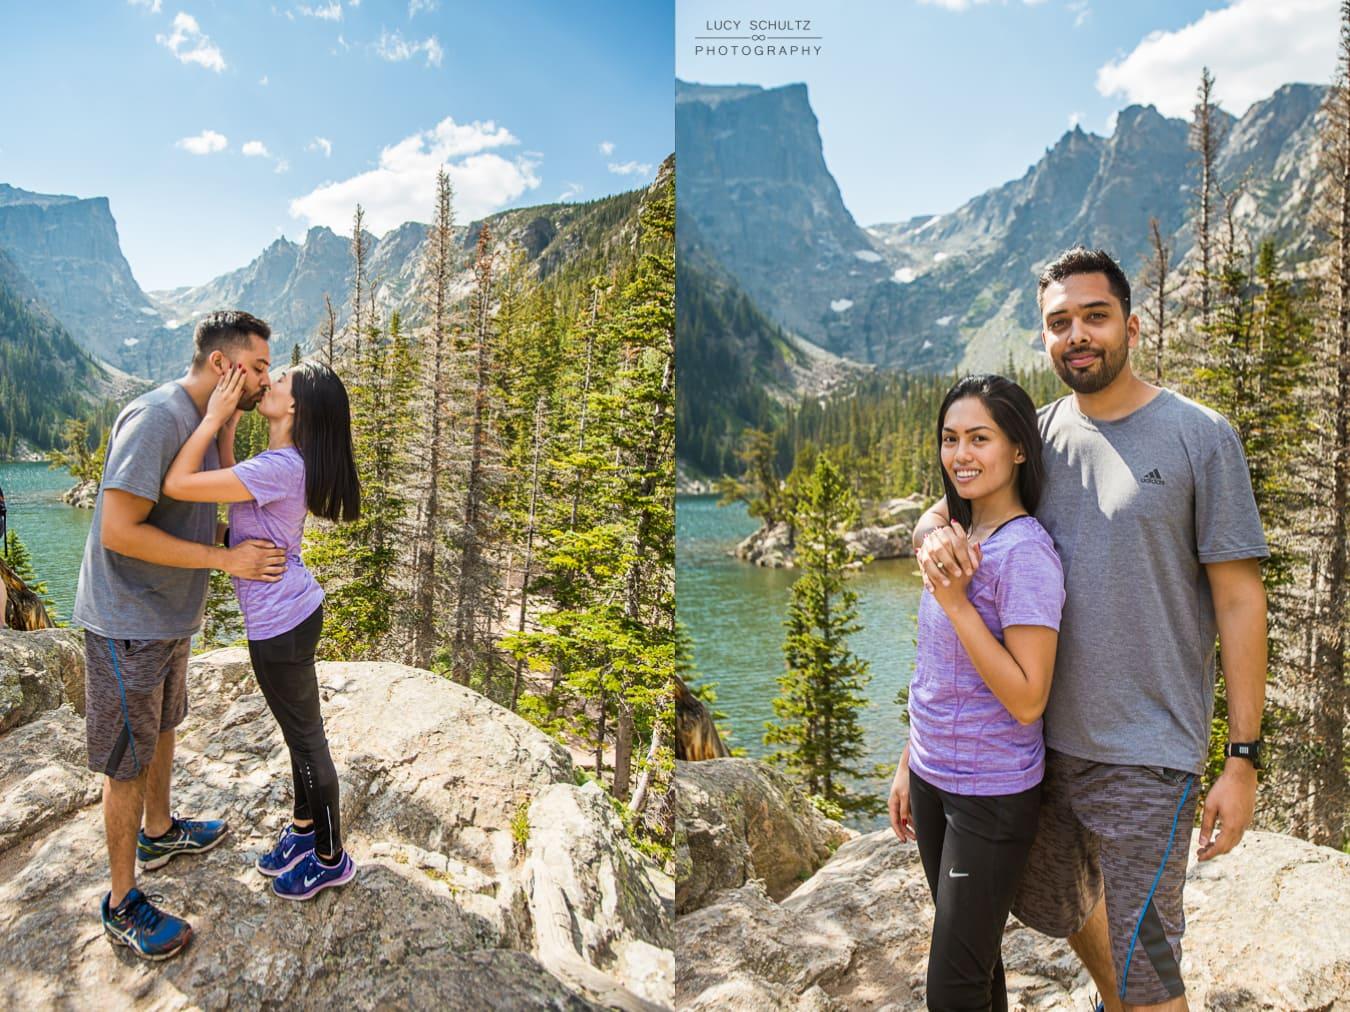 Dream Lake Proposal Photographer – Rocky Mountain National Park Proposal Photographer